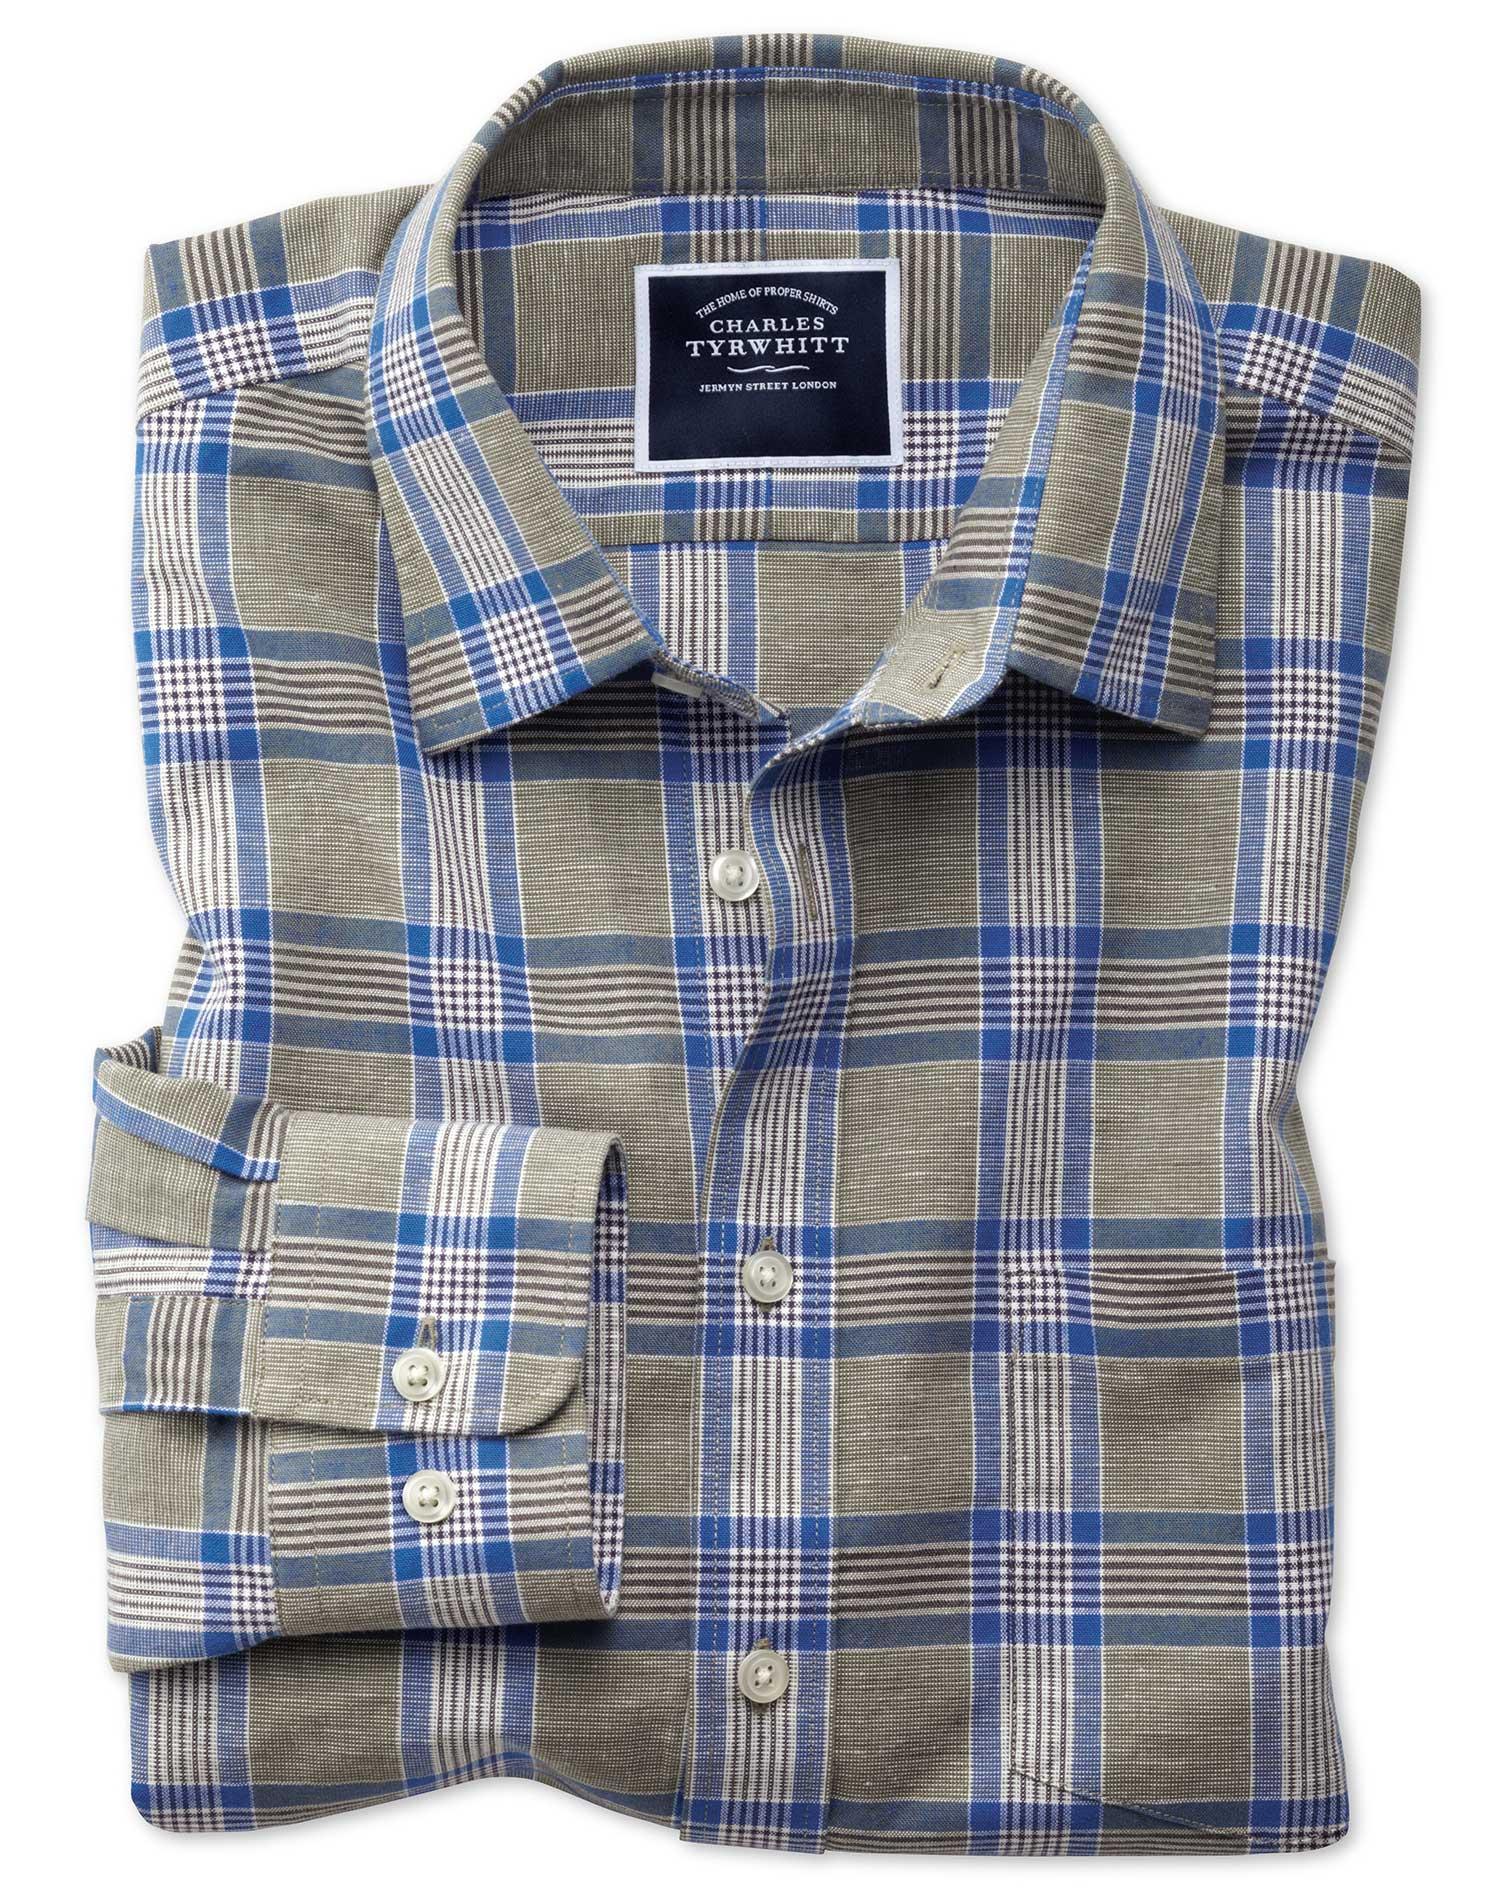 Slim Fit Cotton Linen Khaki Check Shirt Single Cuff Size XL by Charles Tyrwhitt